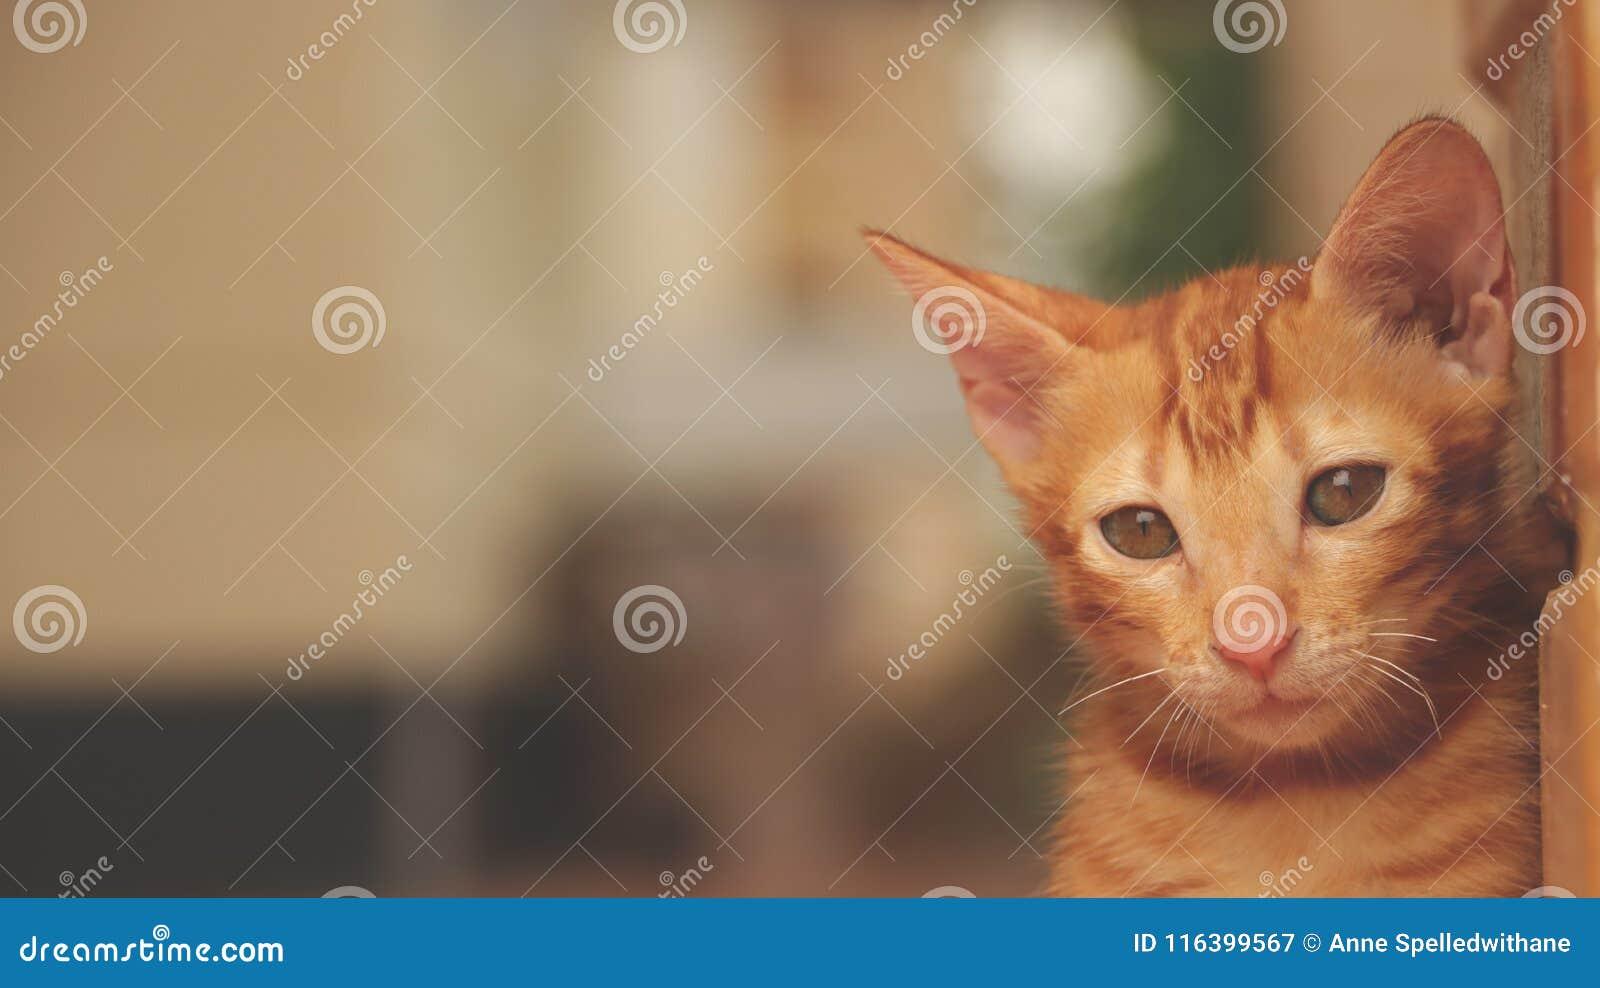 Leuk Weinig Cat Sitting door Gele Muur - Droevig Gezicht